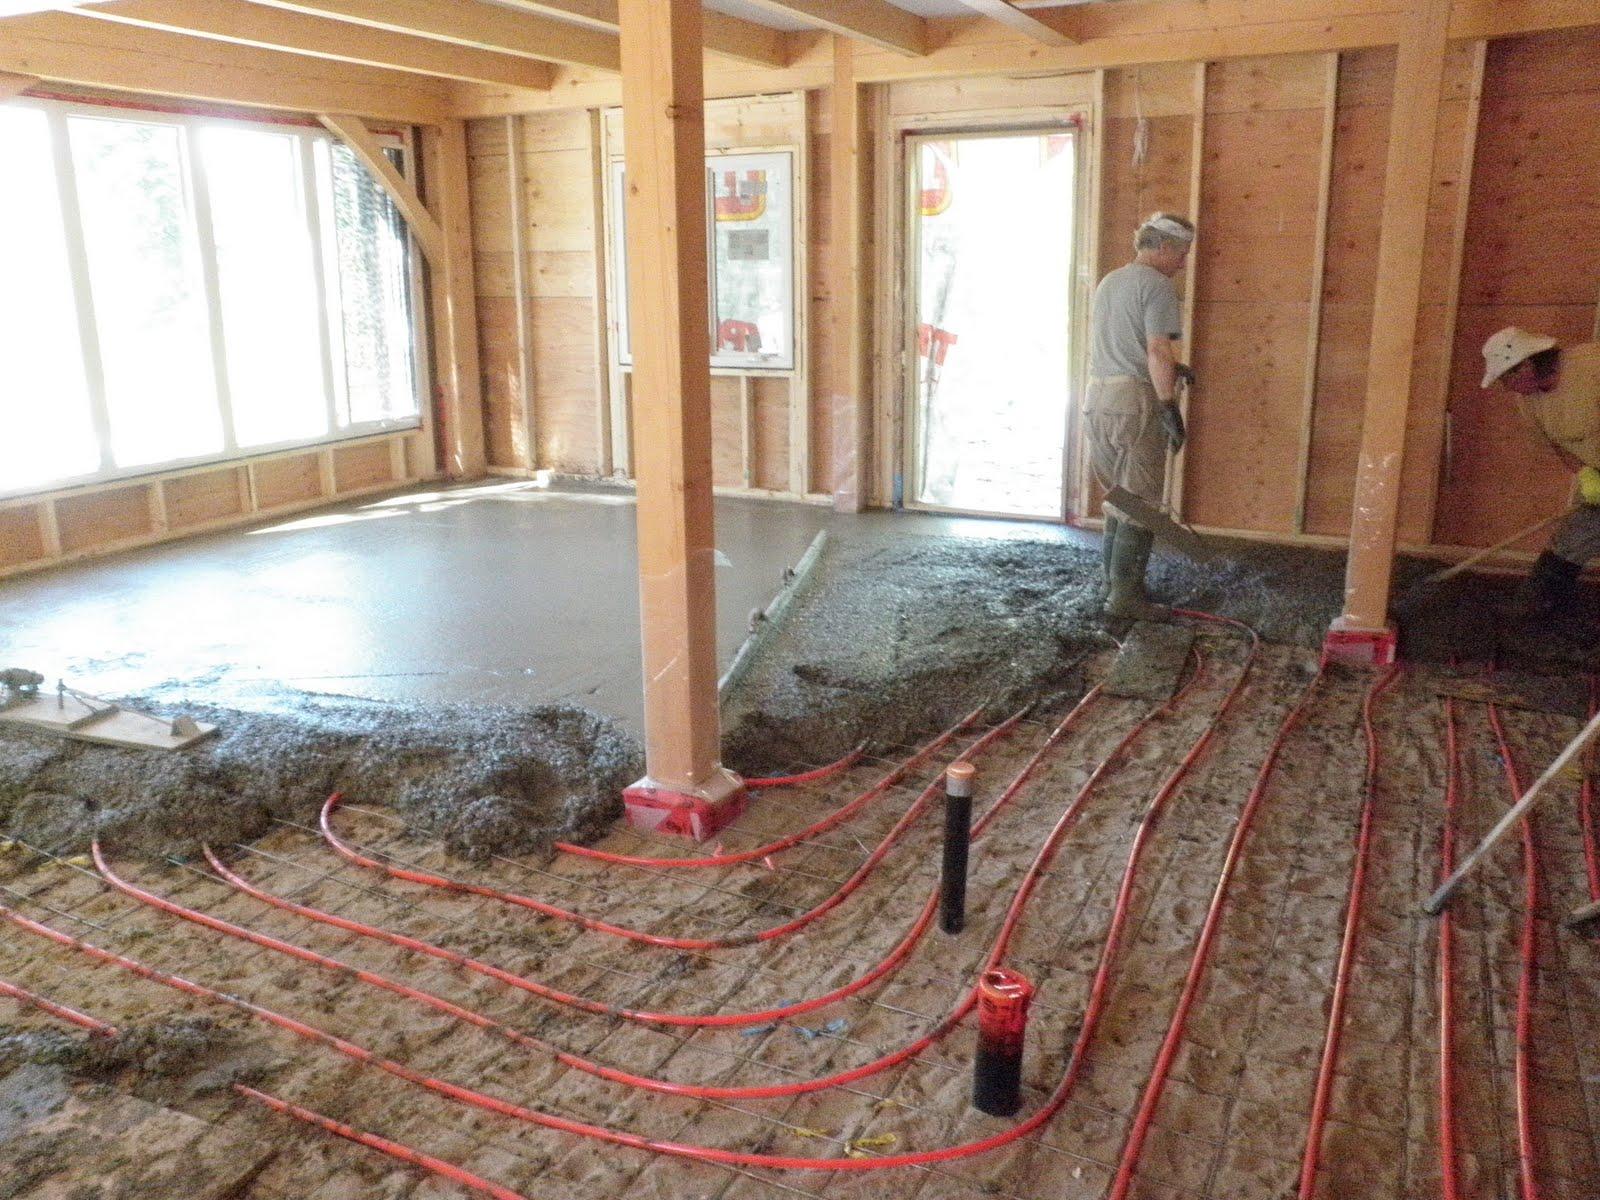 Kootenay House Radiant Floor Heating